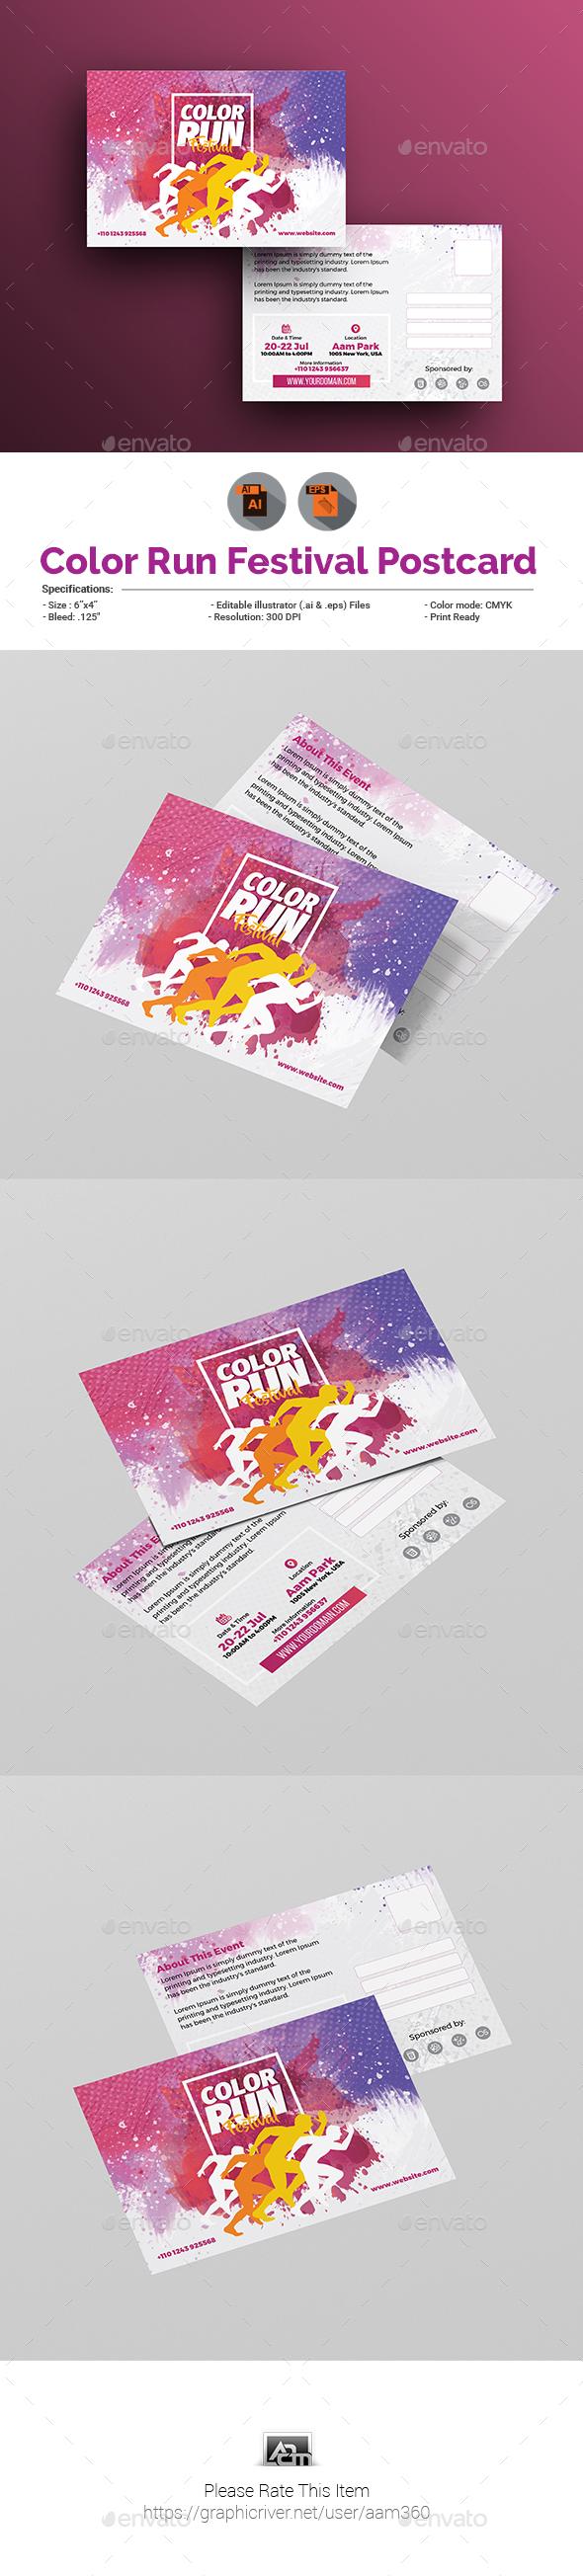 Color Run Festival Postcard Template - Cards & Invites Print Templates